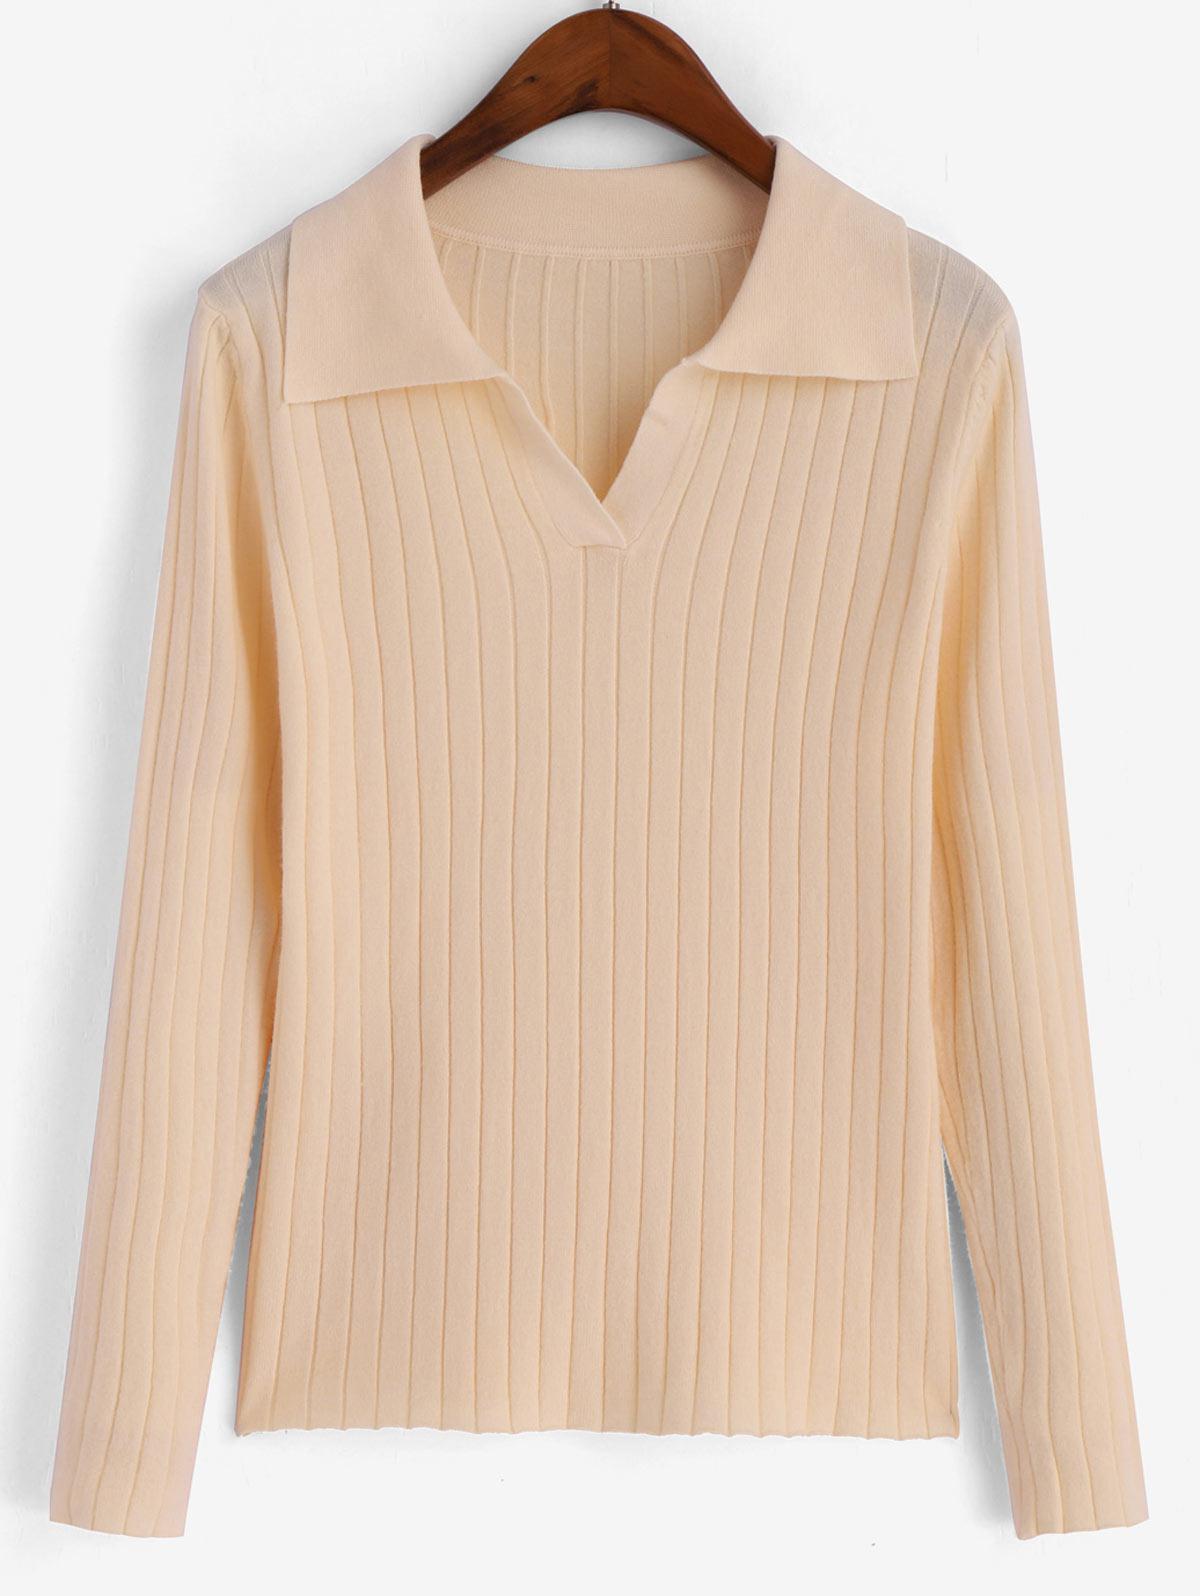 Turn Down Collar Ribbed Long Sleeve Knitwear